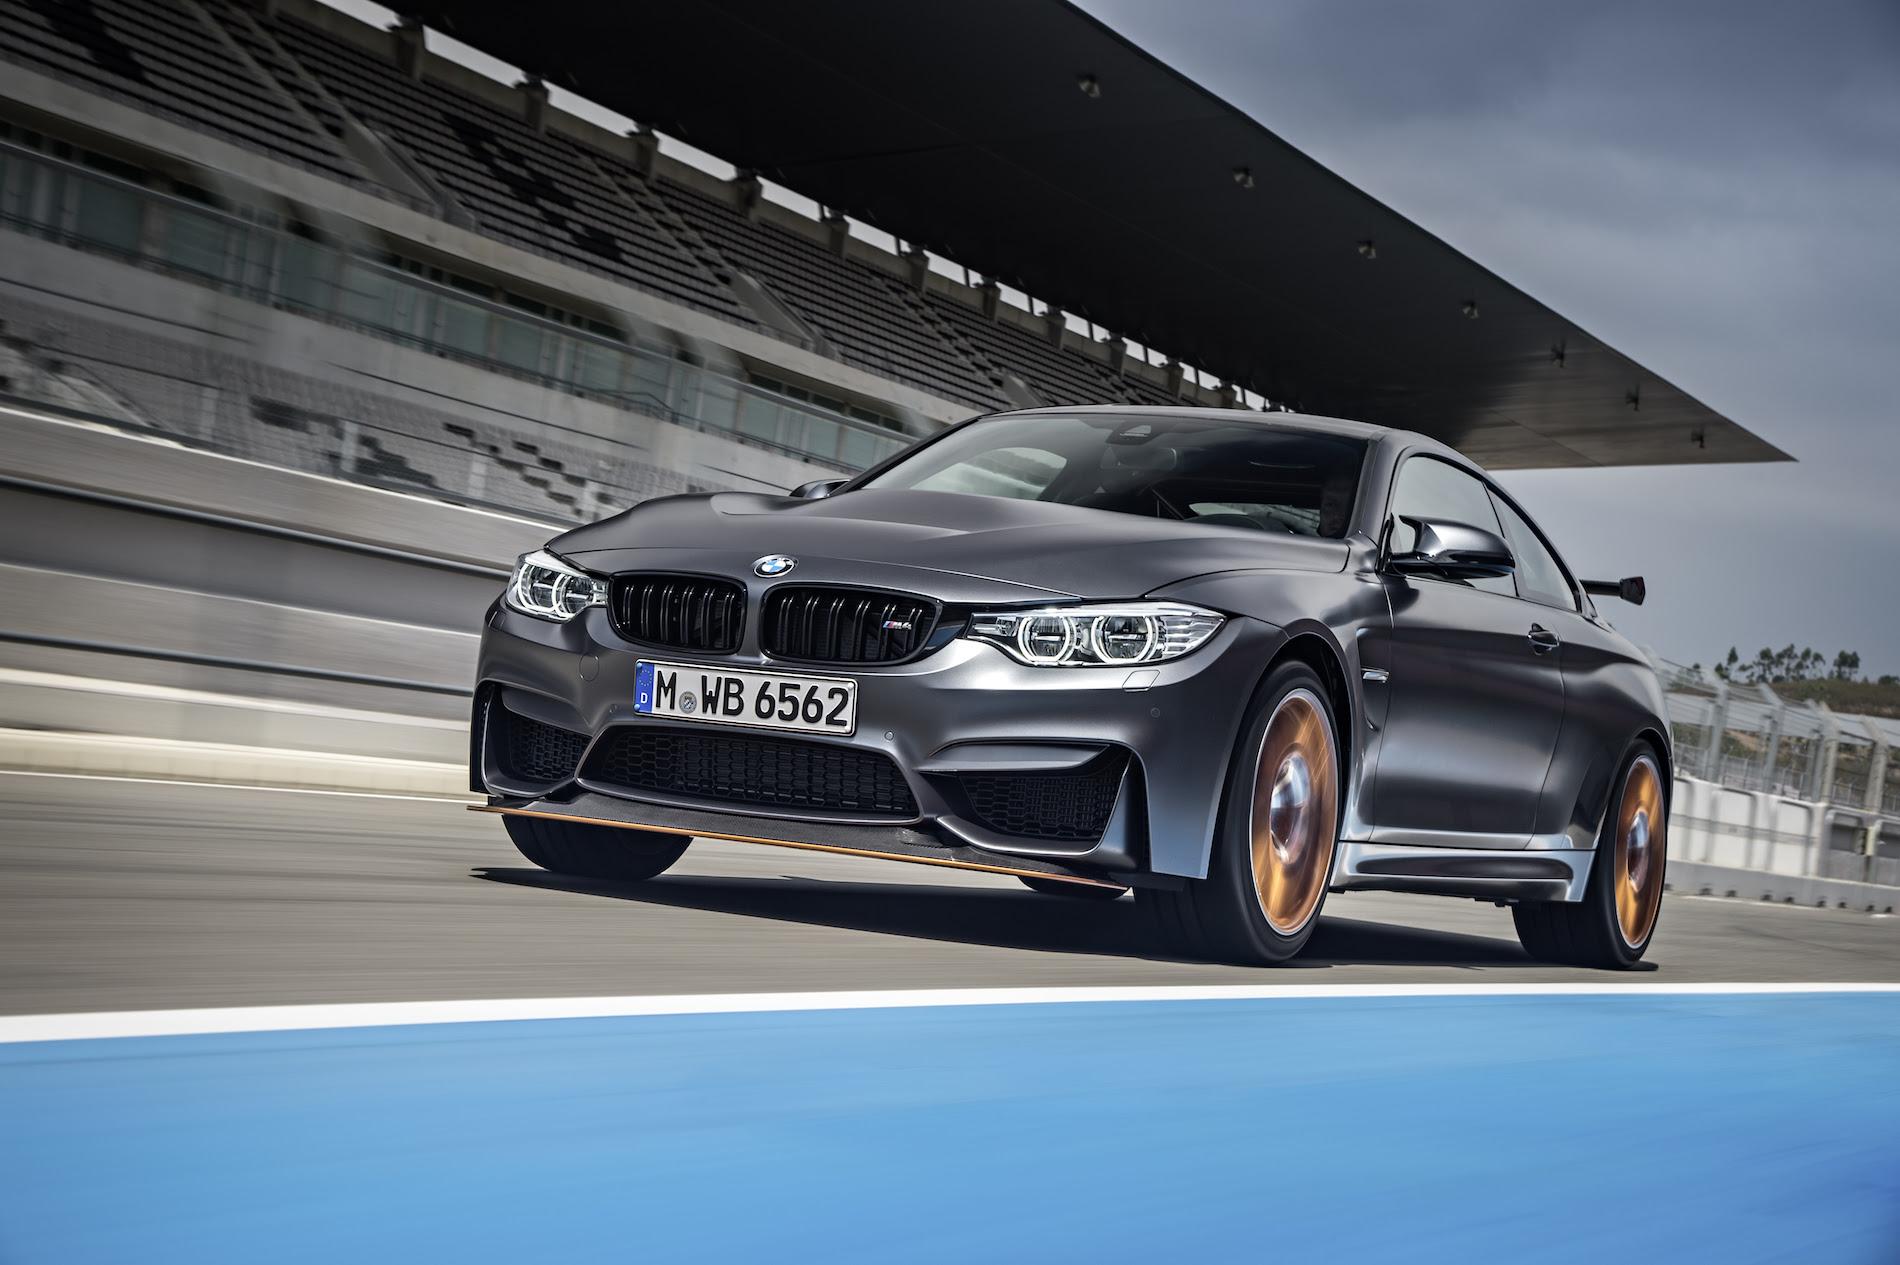 2016 Bmw M4 Gts Us Pricing Starts At 134200